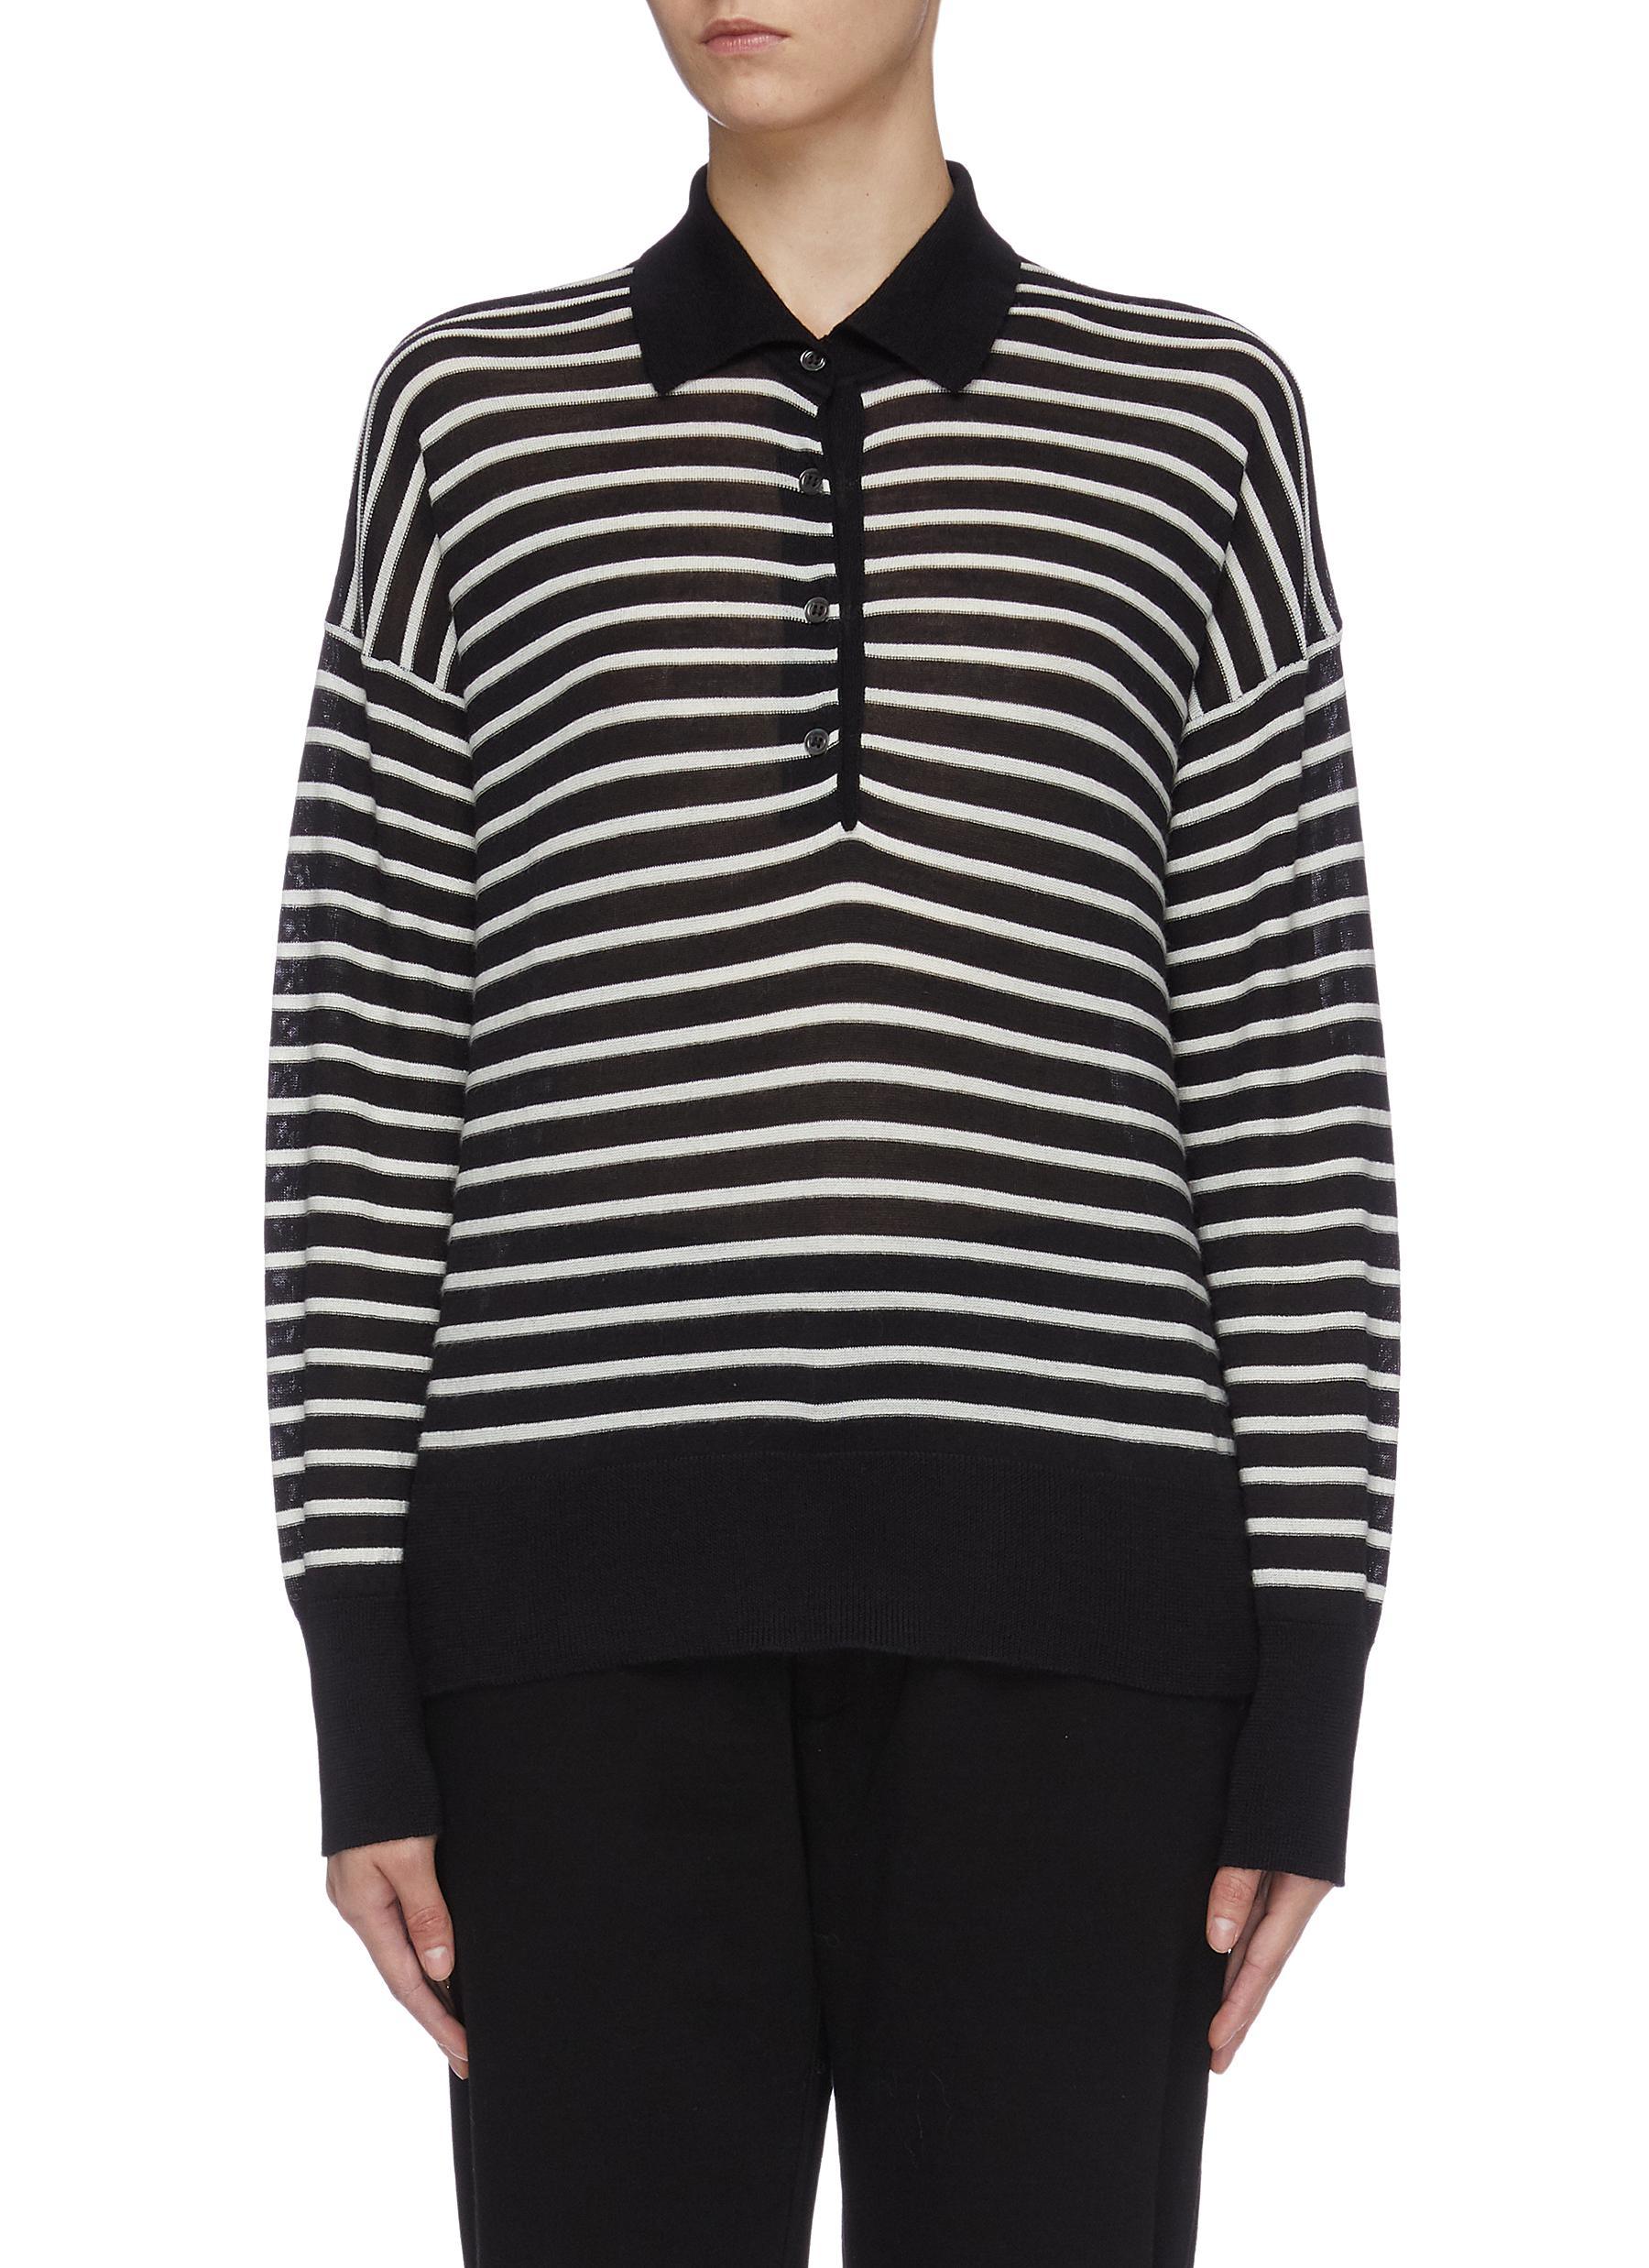 Zoe wool-silk-cashmere polo shirt by Barena